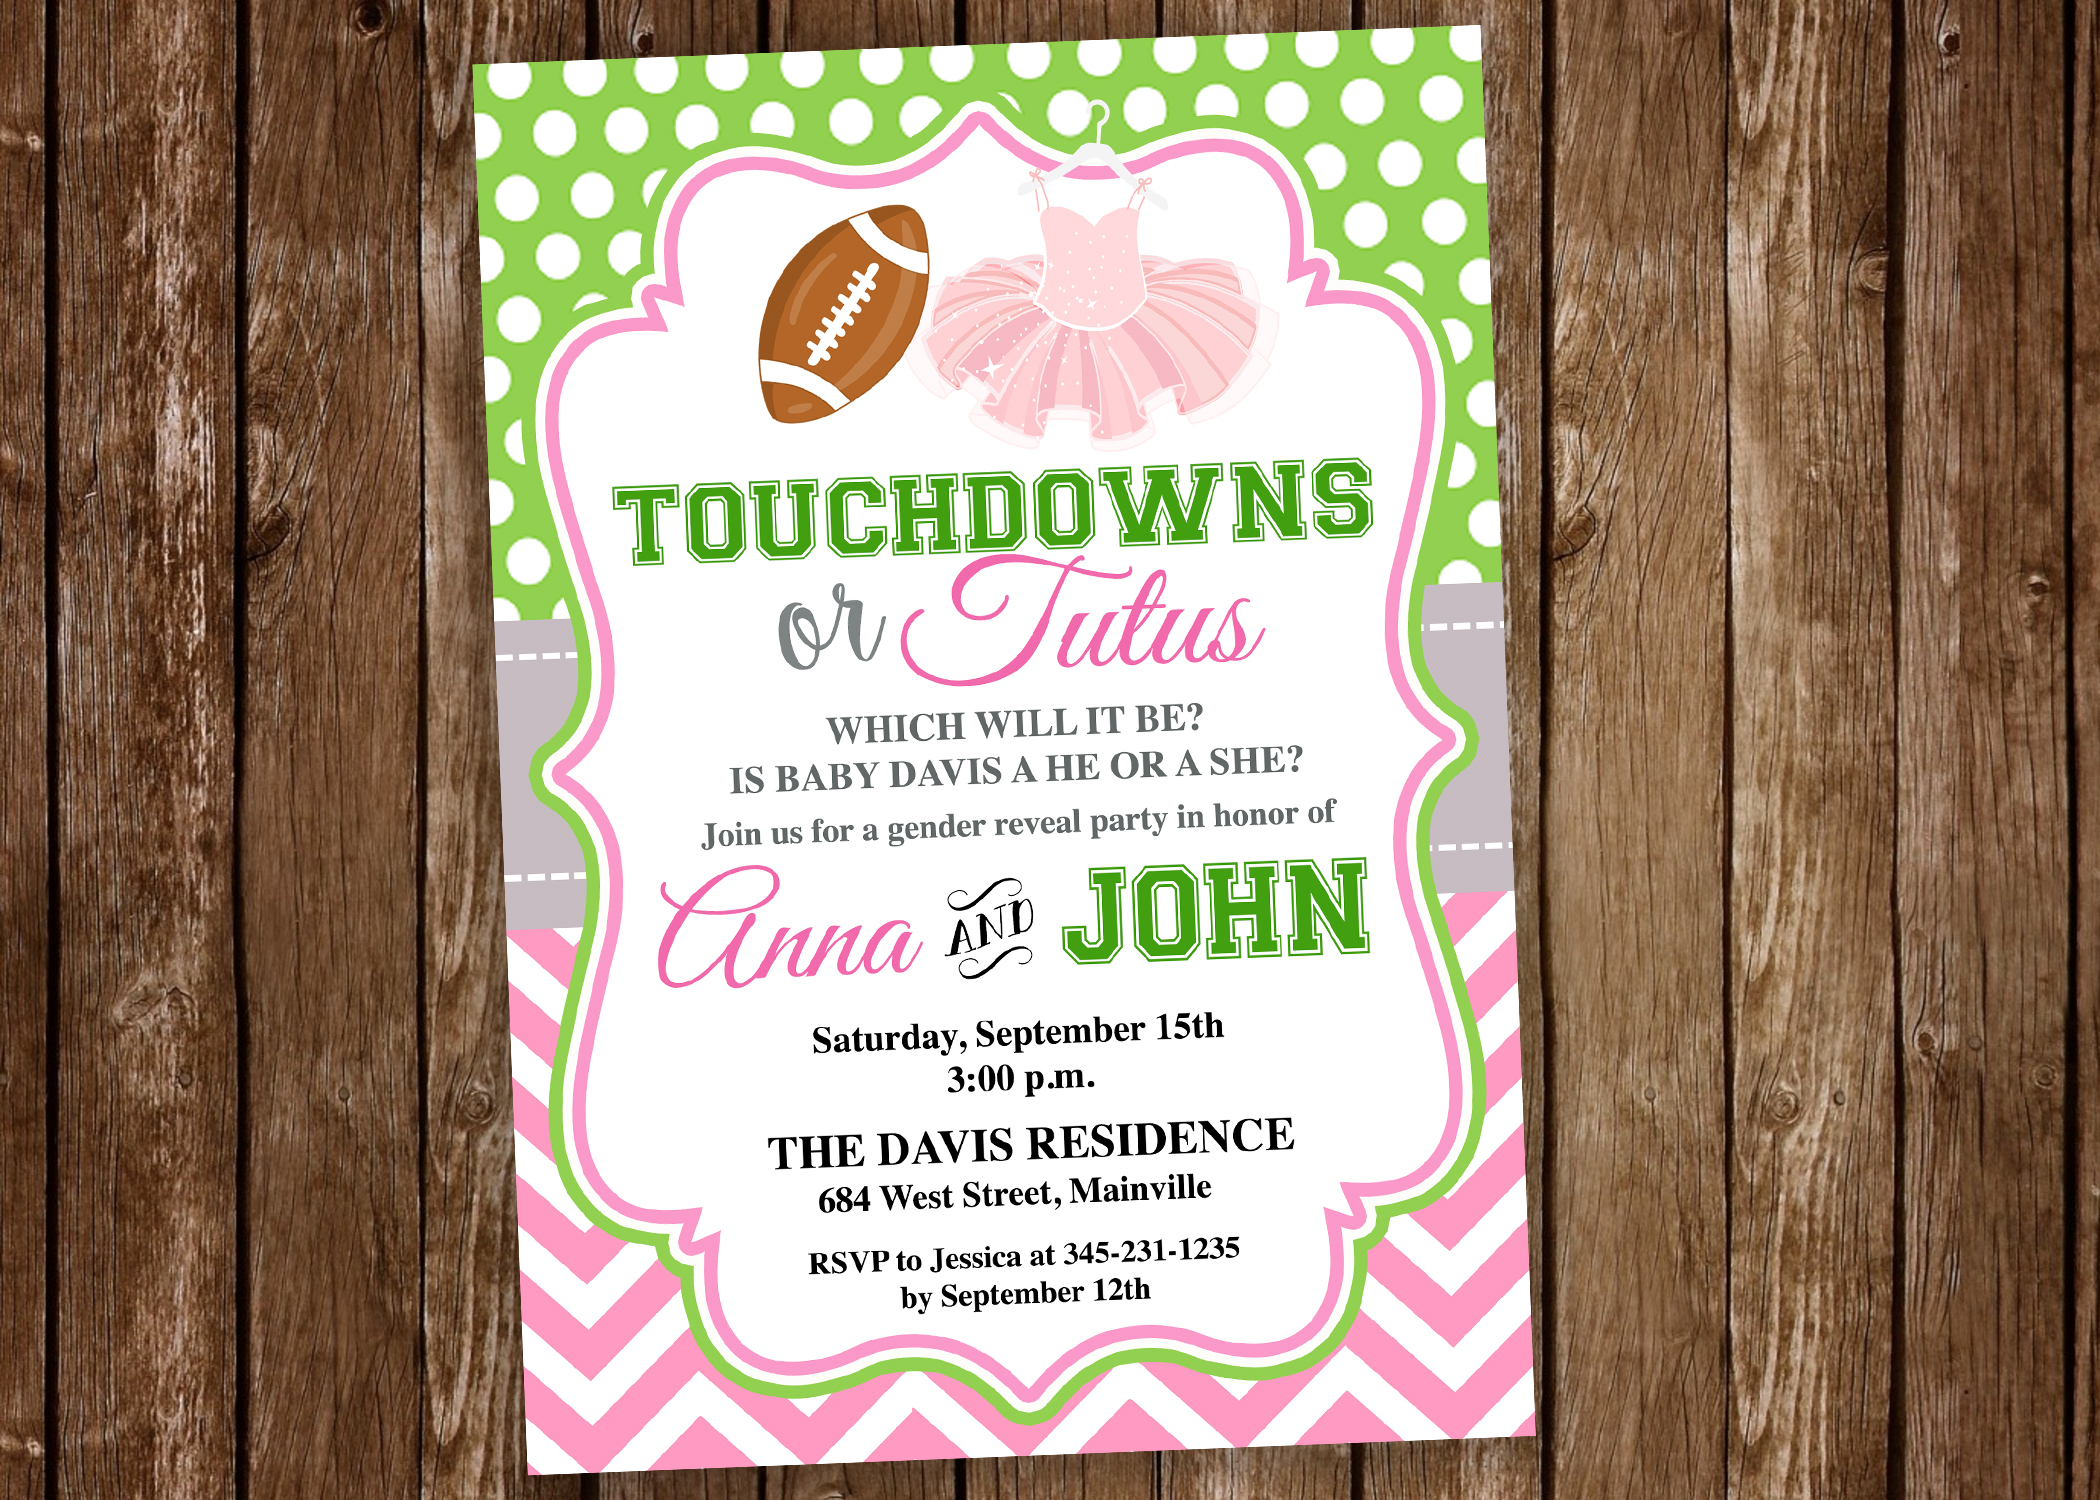 Touchdowns or tutus gender reveal invitation football tutu boy or touchdowns or tutus gender reveal invitation football tutu boy or girl gender filmwisefo